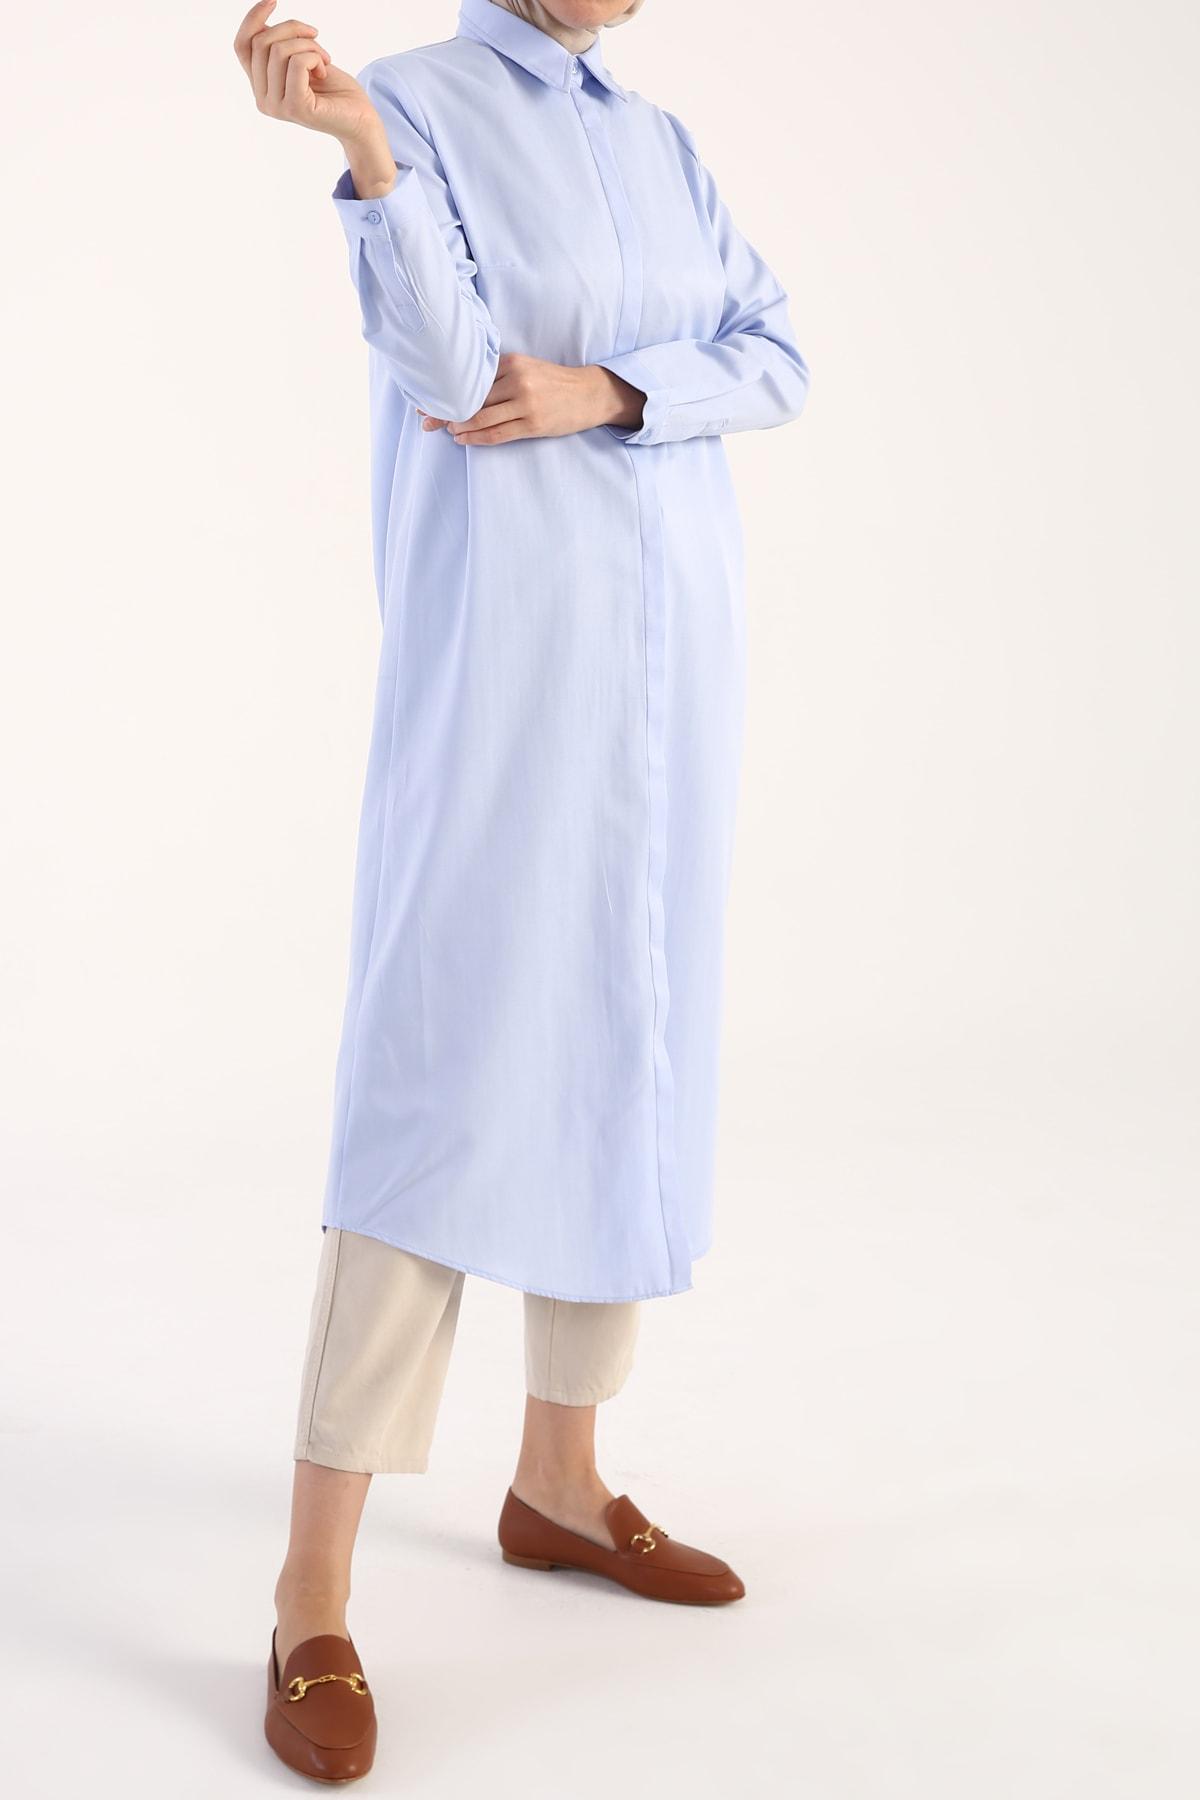 Mavi Pamuklu Uzun Gömlek